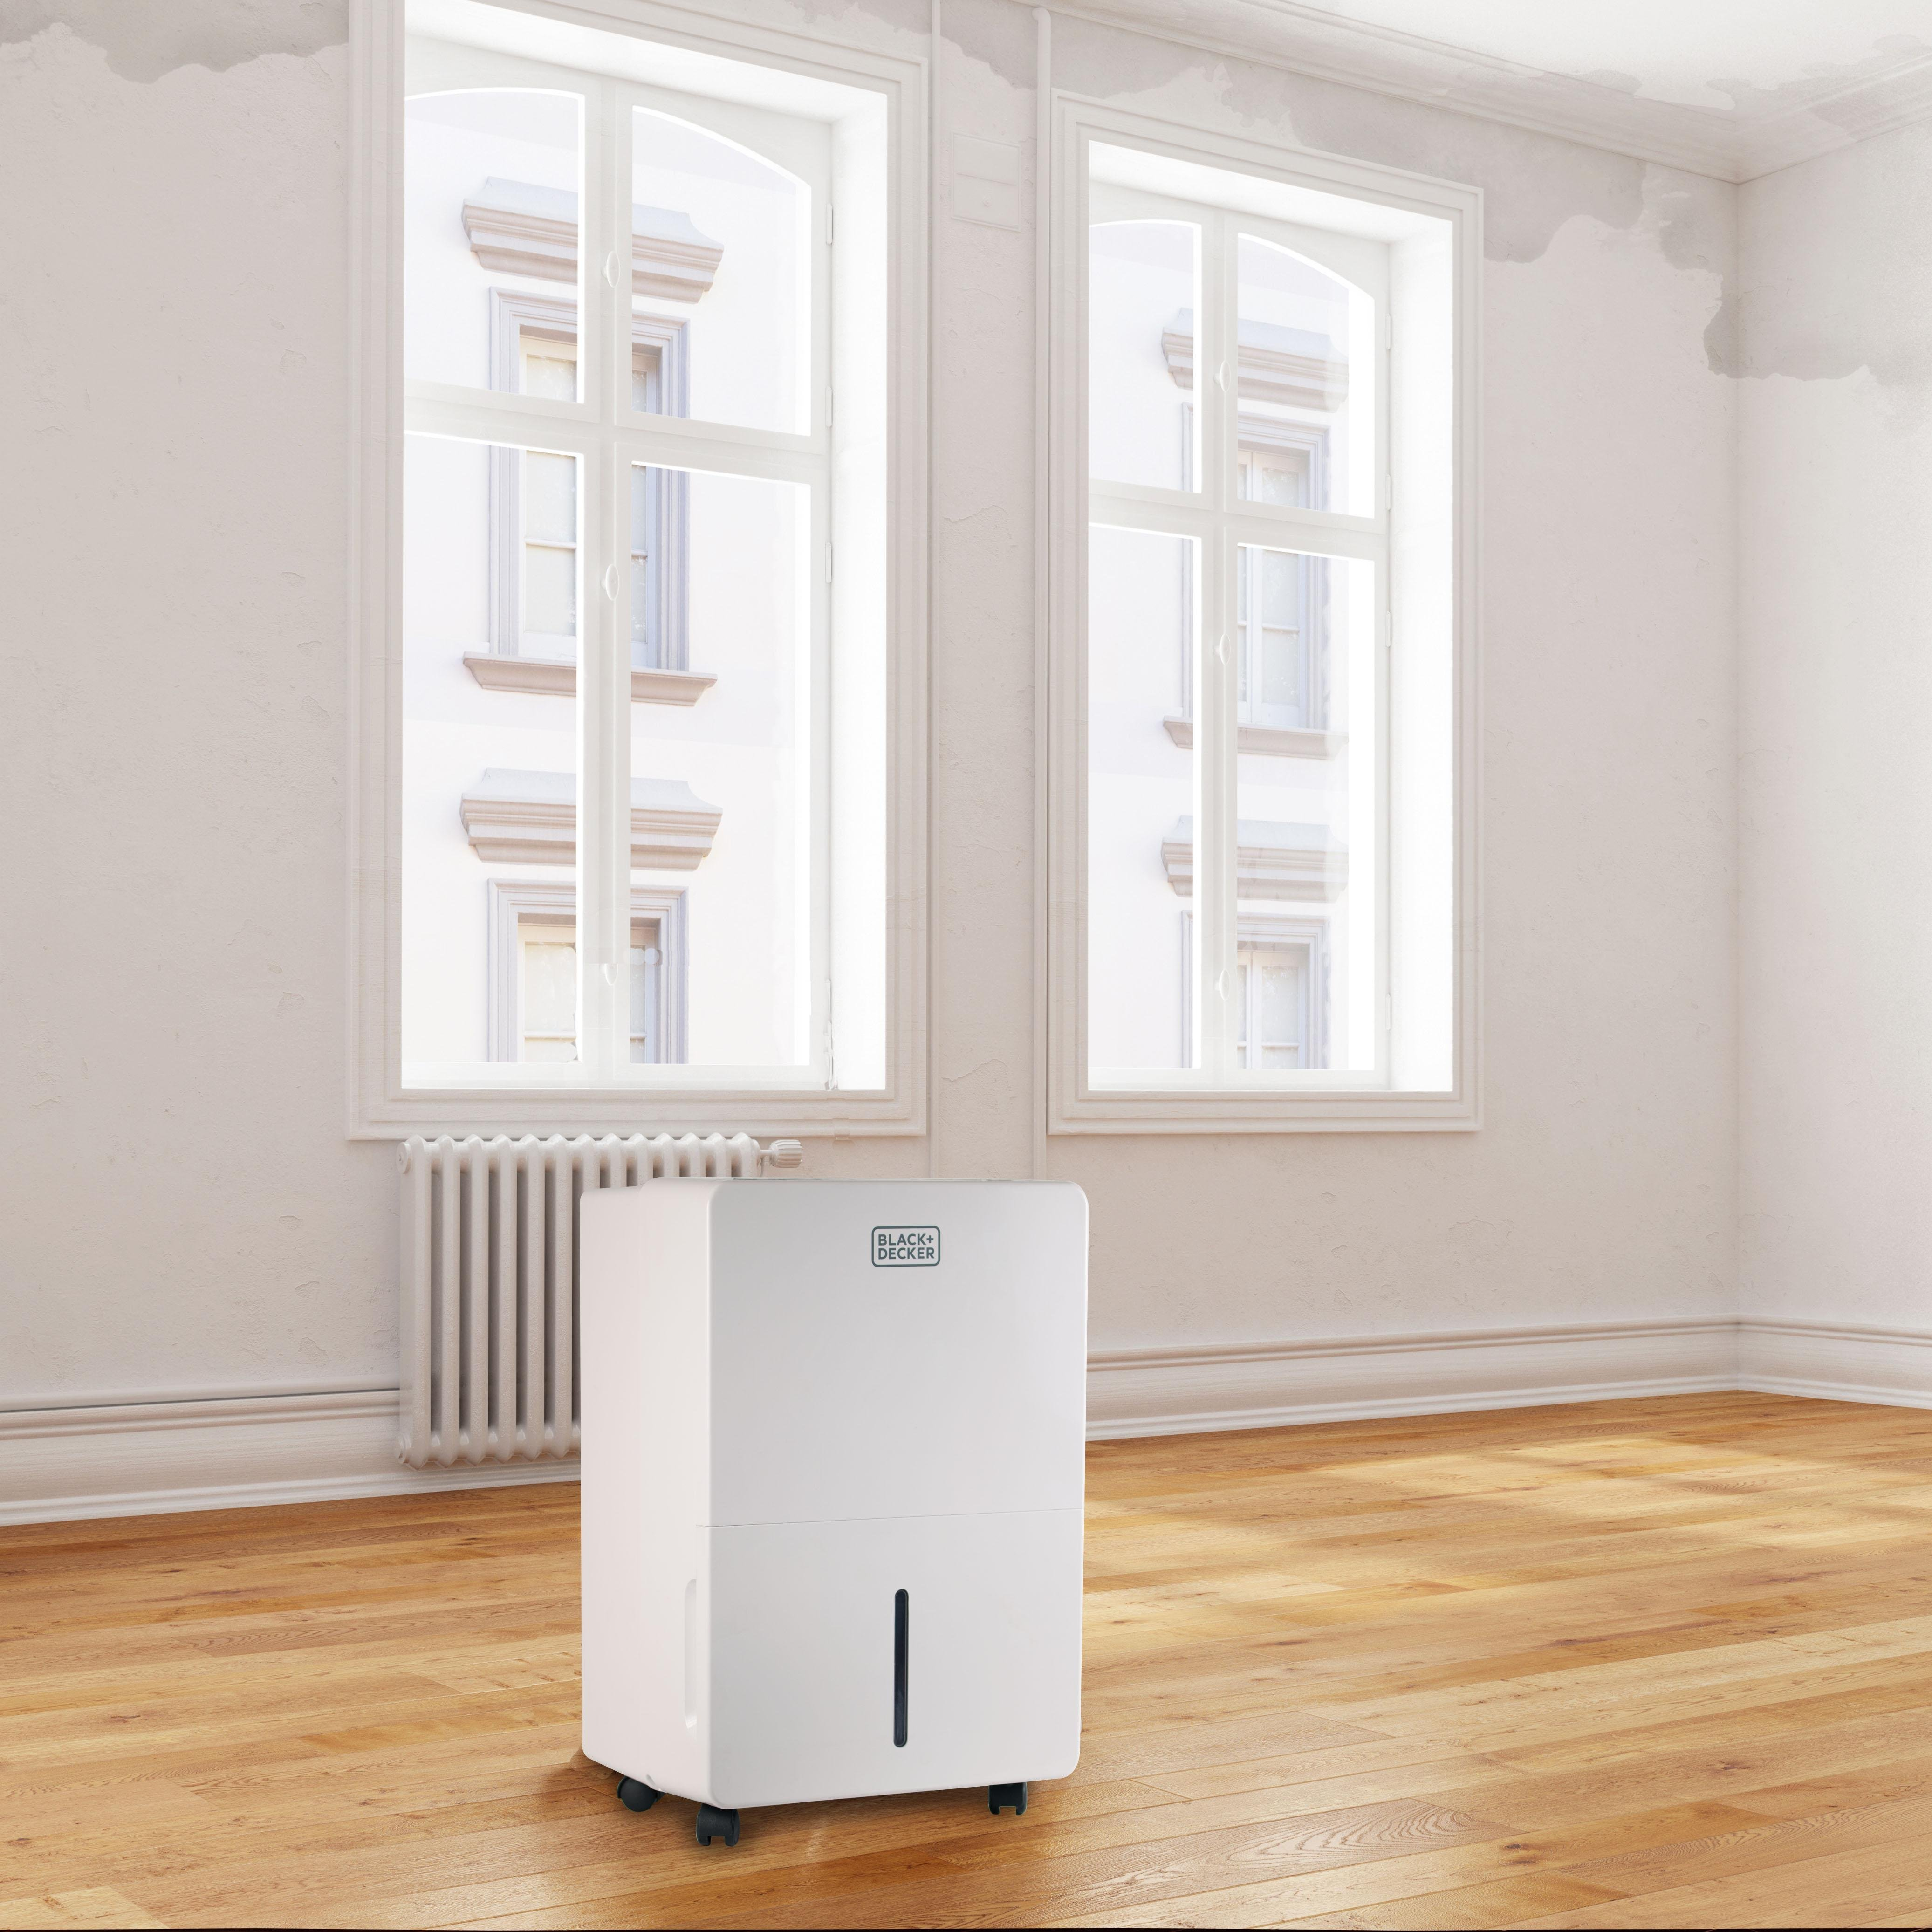 humidifier or dehumidifier for basement